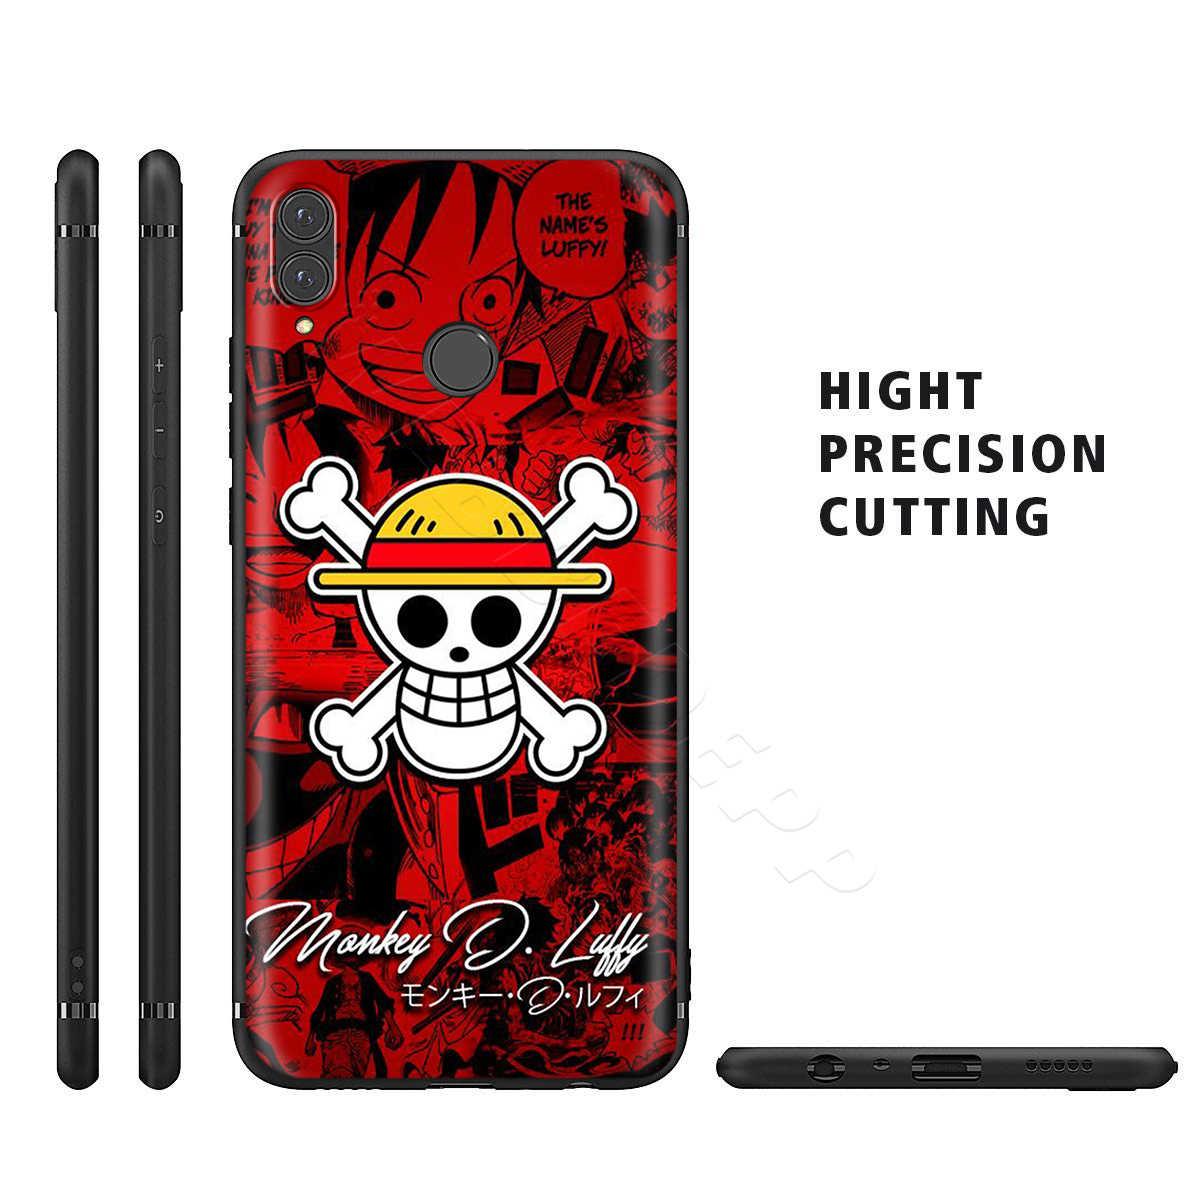 Webbedepp Pirati One Piece per Il Caso di Huawei P8 P9 P10 P20 P30 Lite Pro P Smart Z 2019 2019 Mini